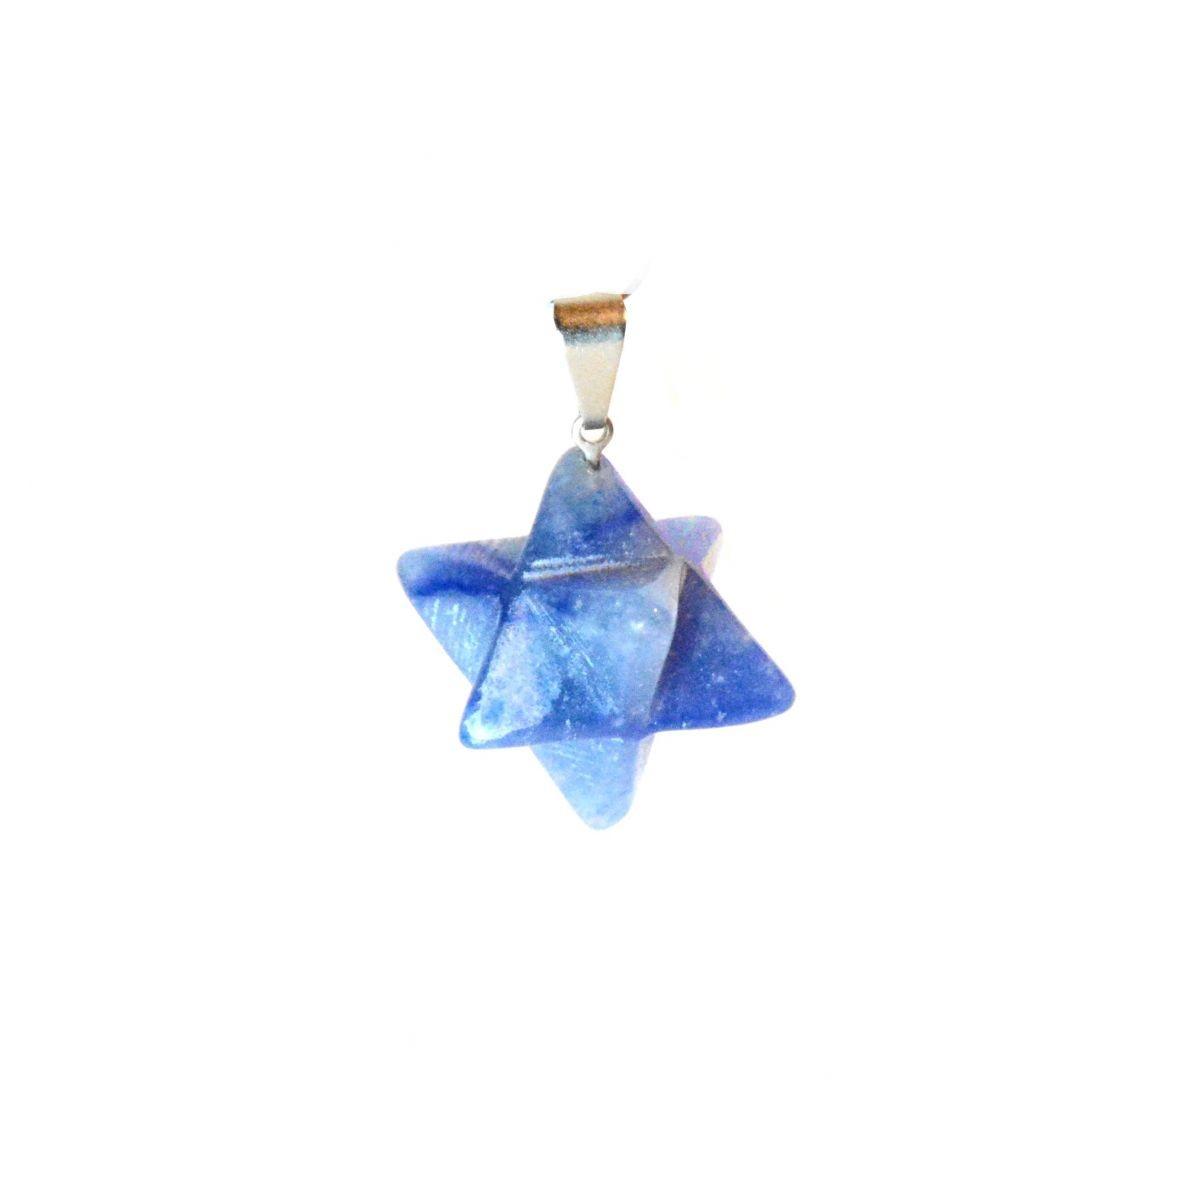 Merkabah - quartzo azul  -  Zots